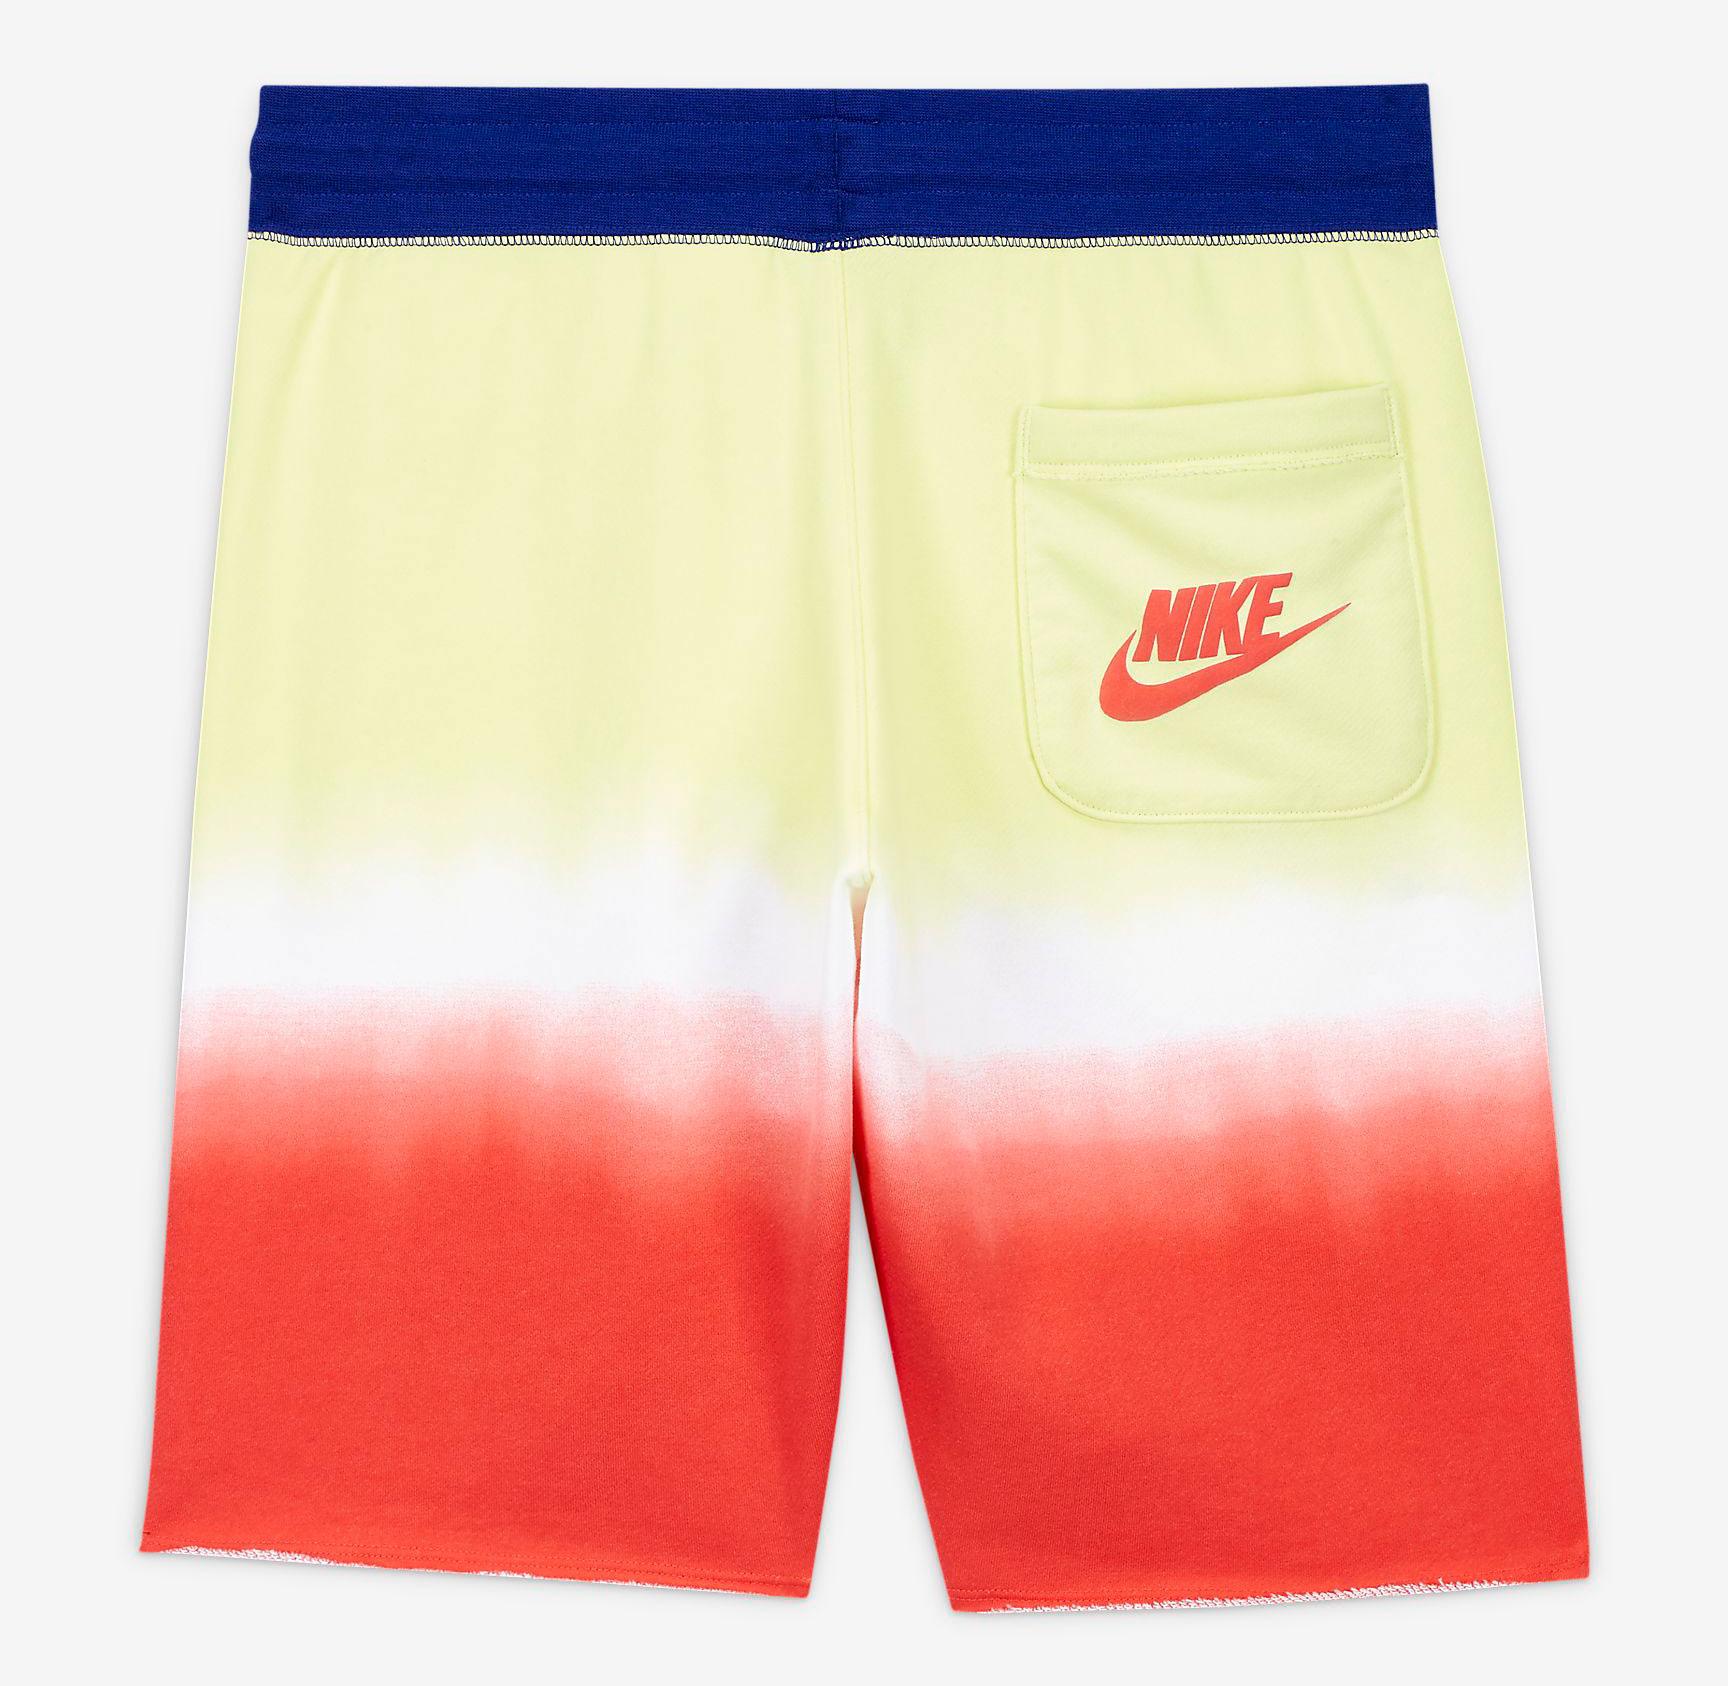 nike-alumni-americana-usa-tie-dye-shorts-2